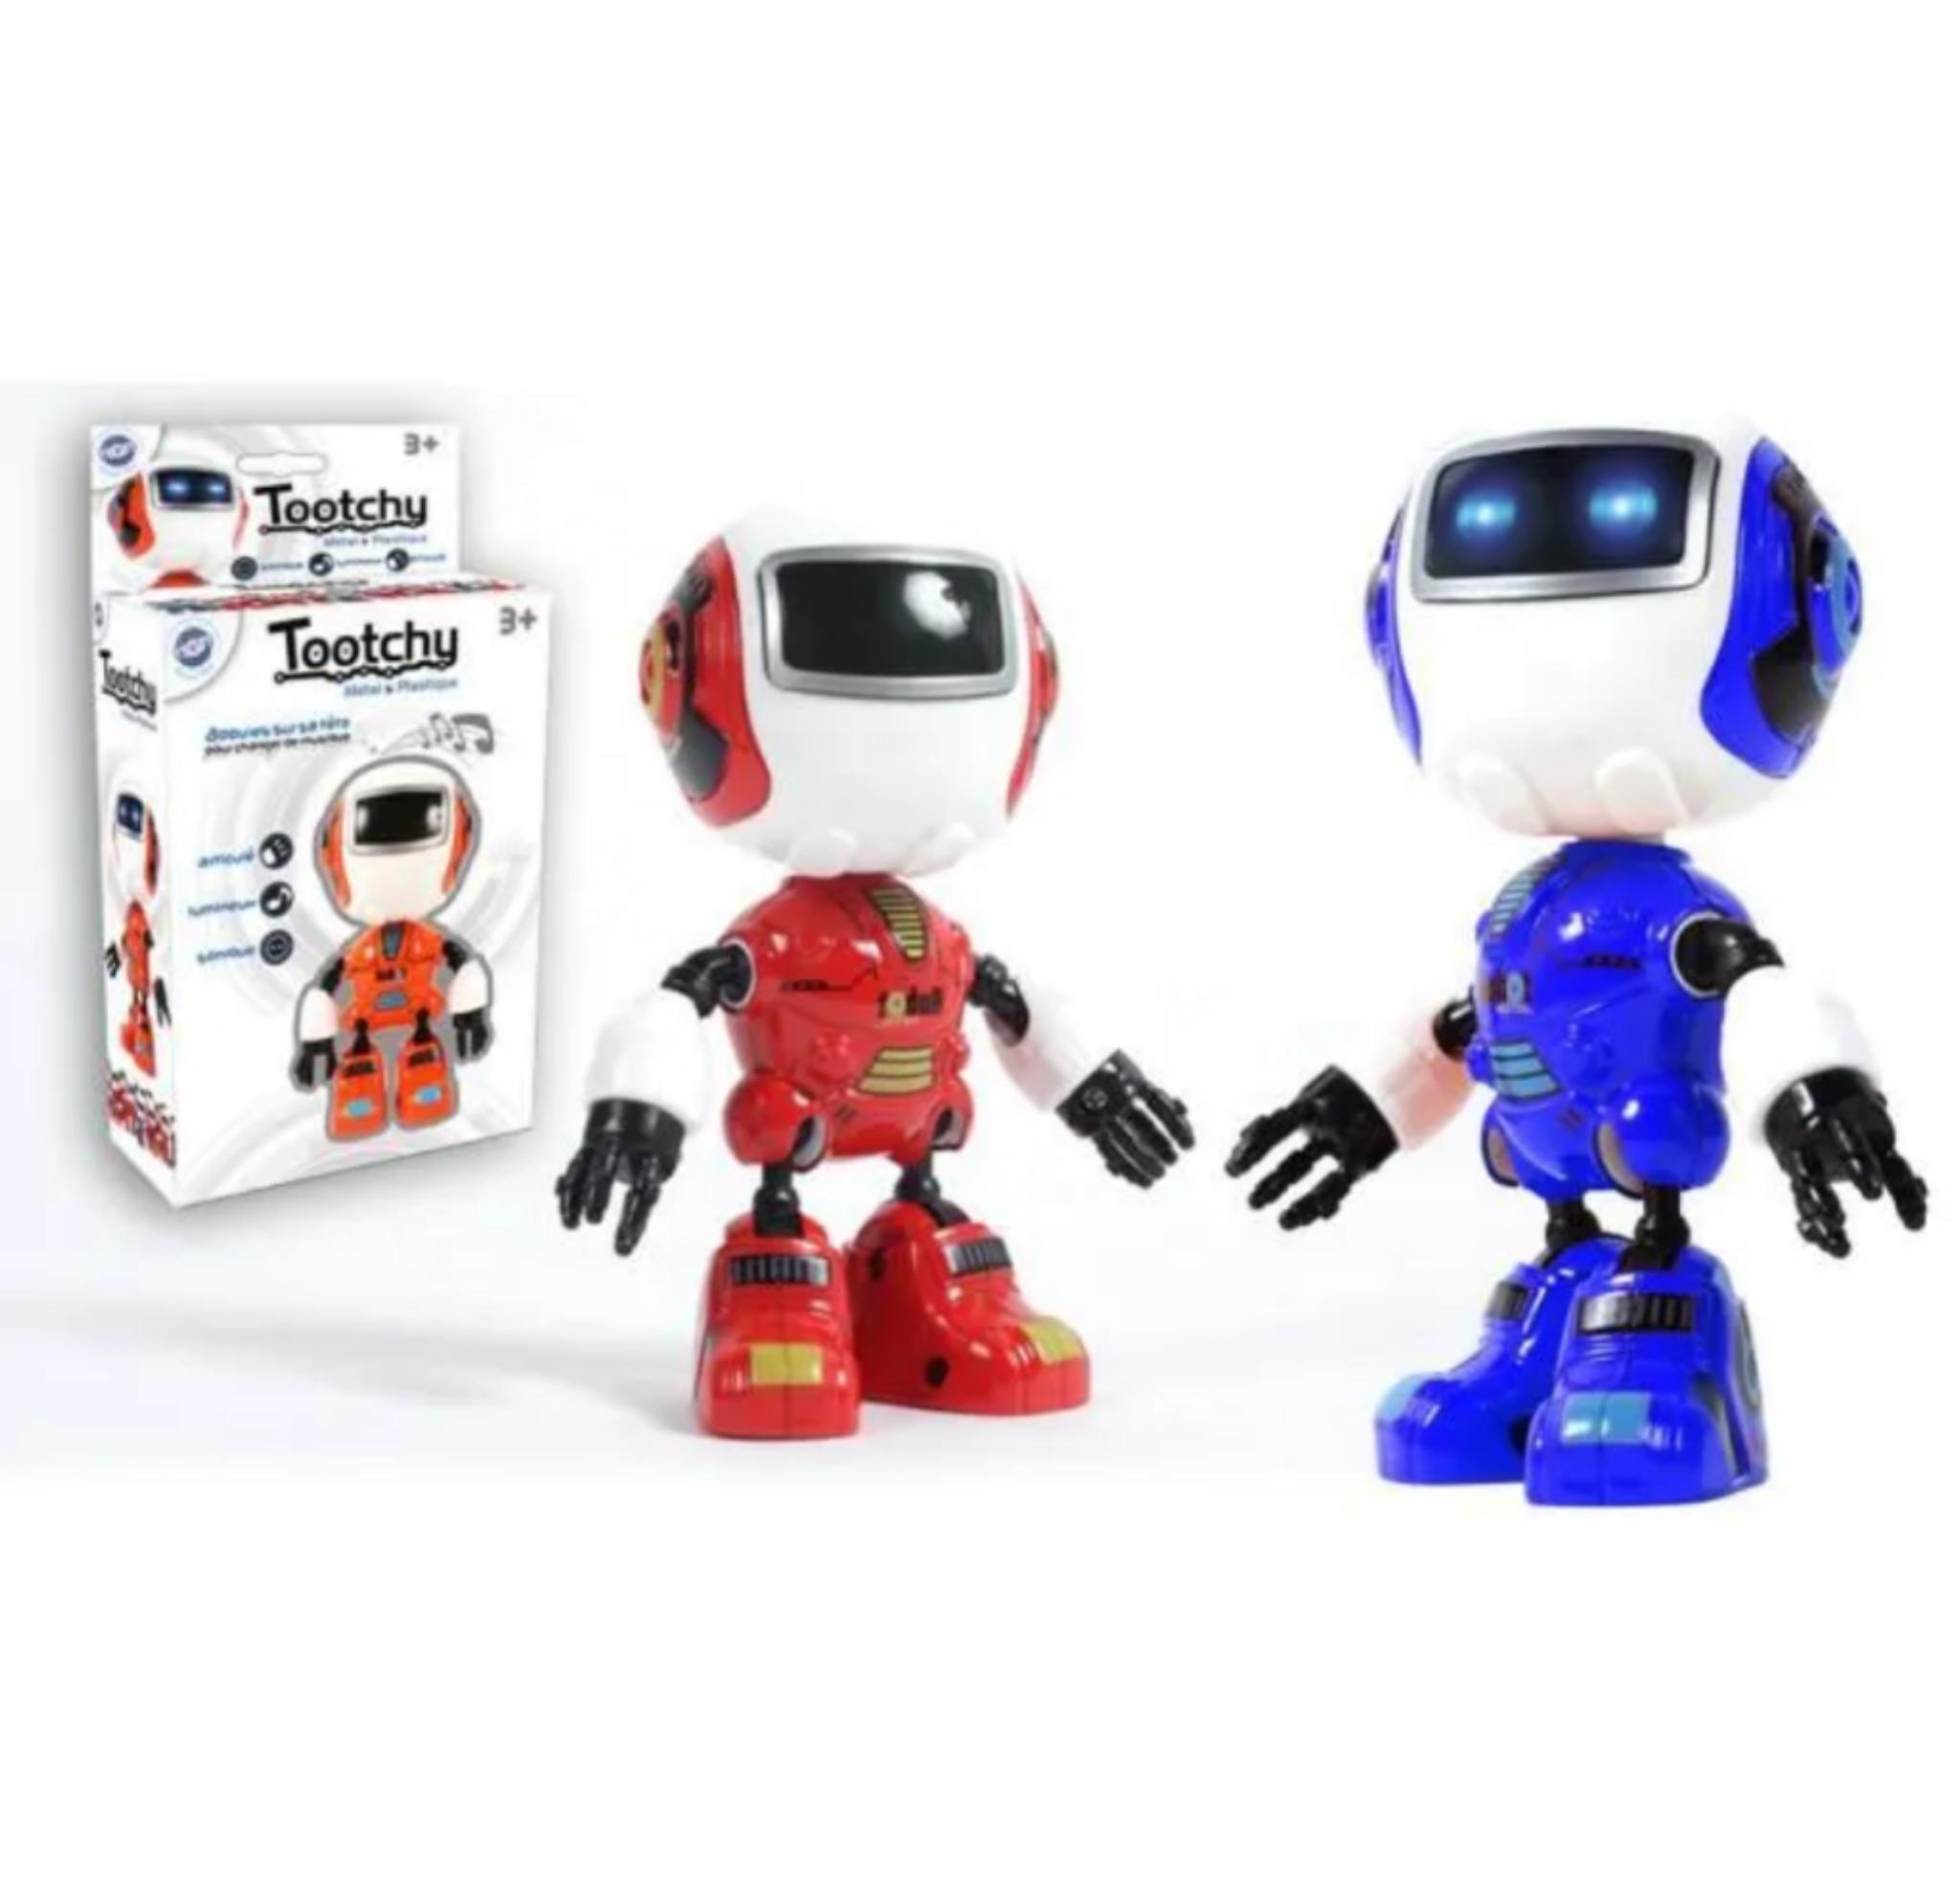 Robot Tootchy métal - 12cm